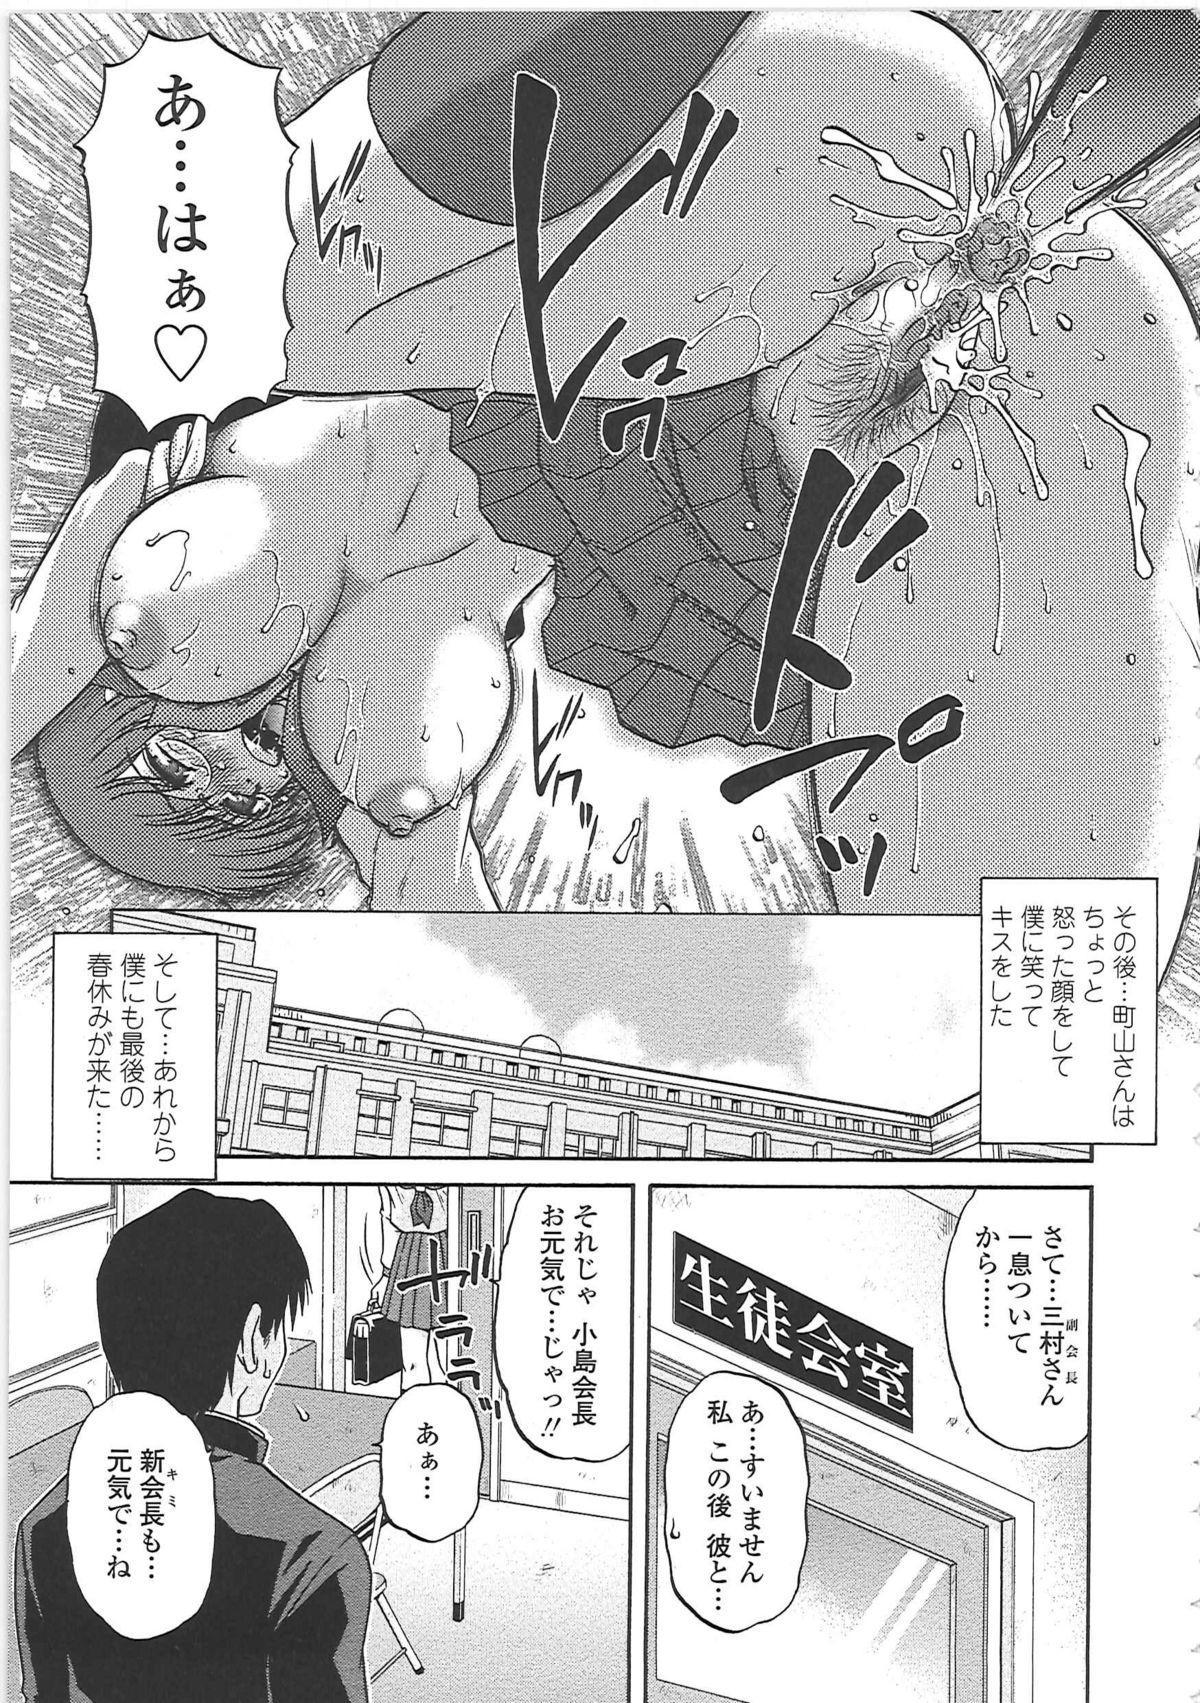 Nikuzuma Tsuushin - Erotic Wife Communication 93